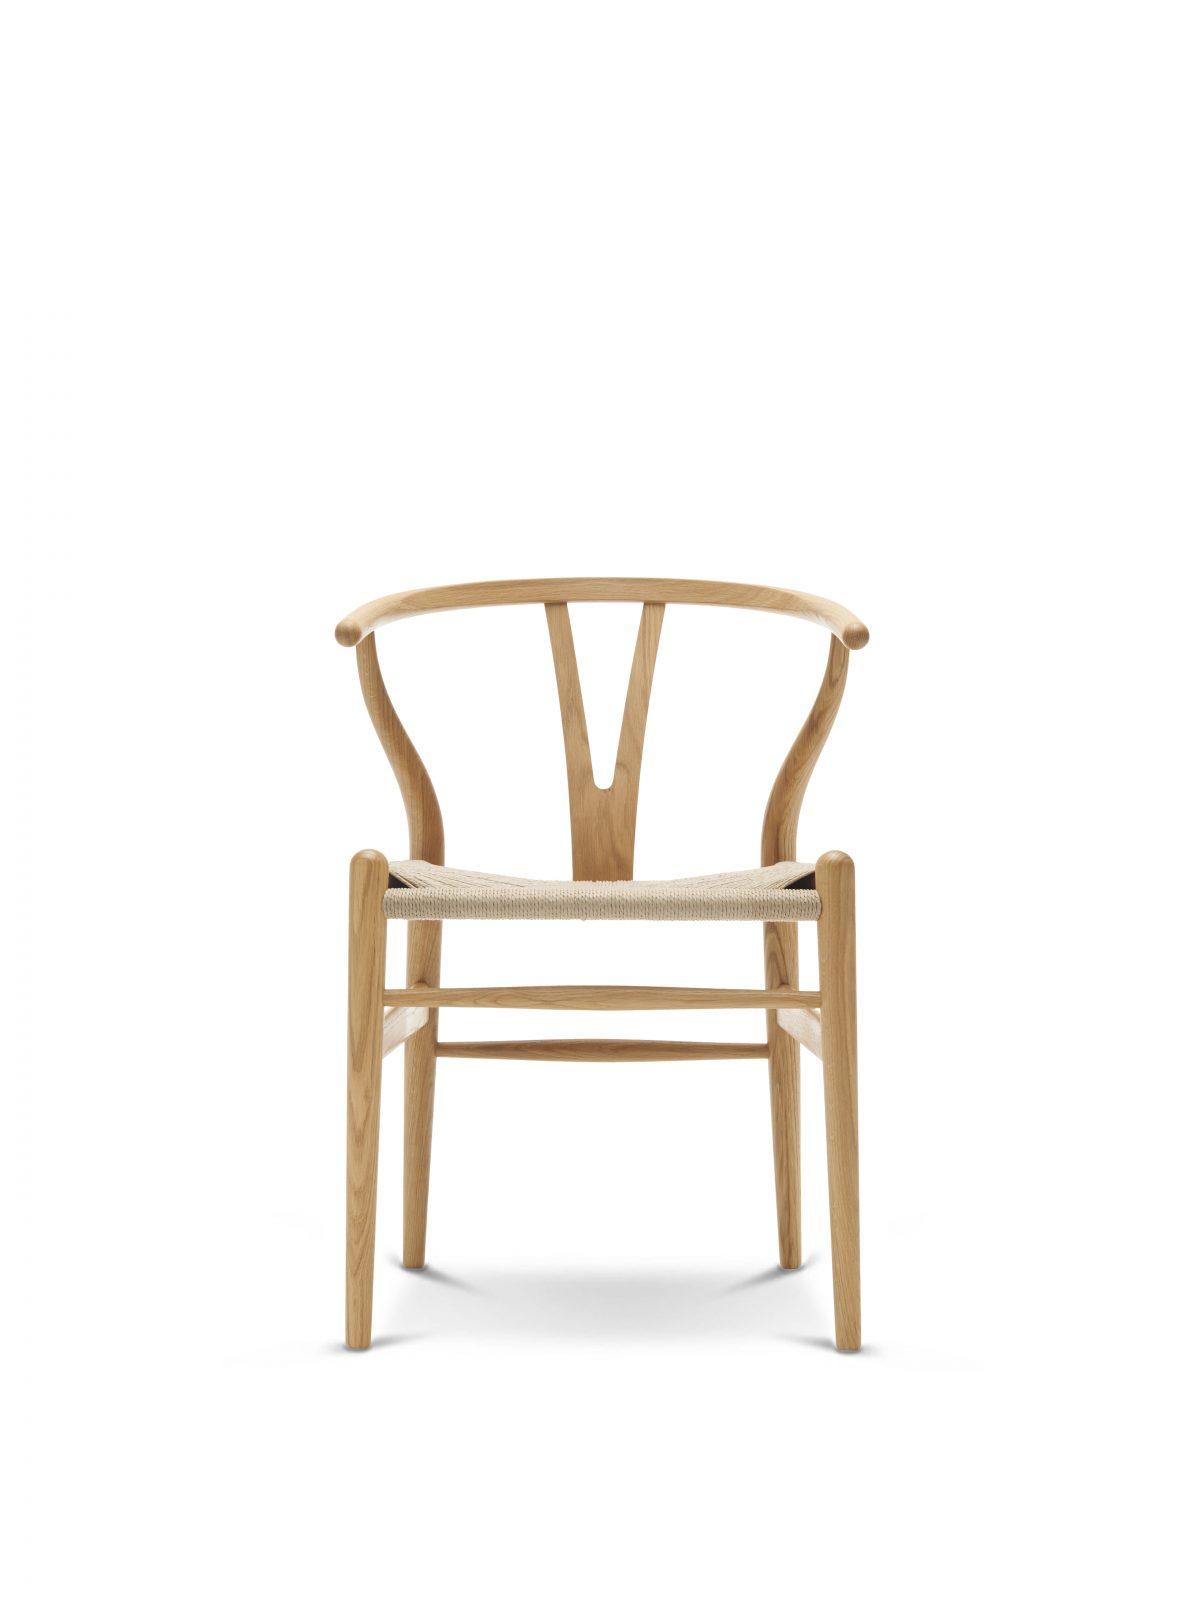 carl hansen ch24 wishbone stuhl nordic urban berlin. Black Bedroom Furniture Sets. Home Design Ideas